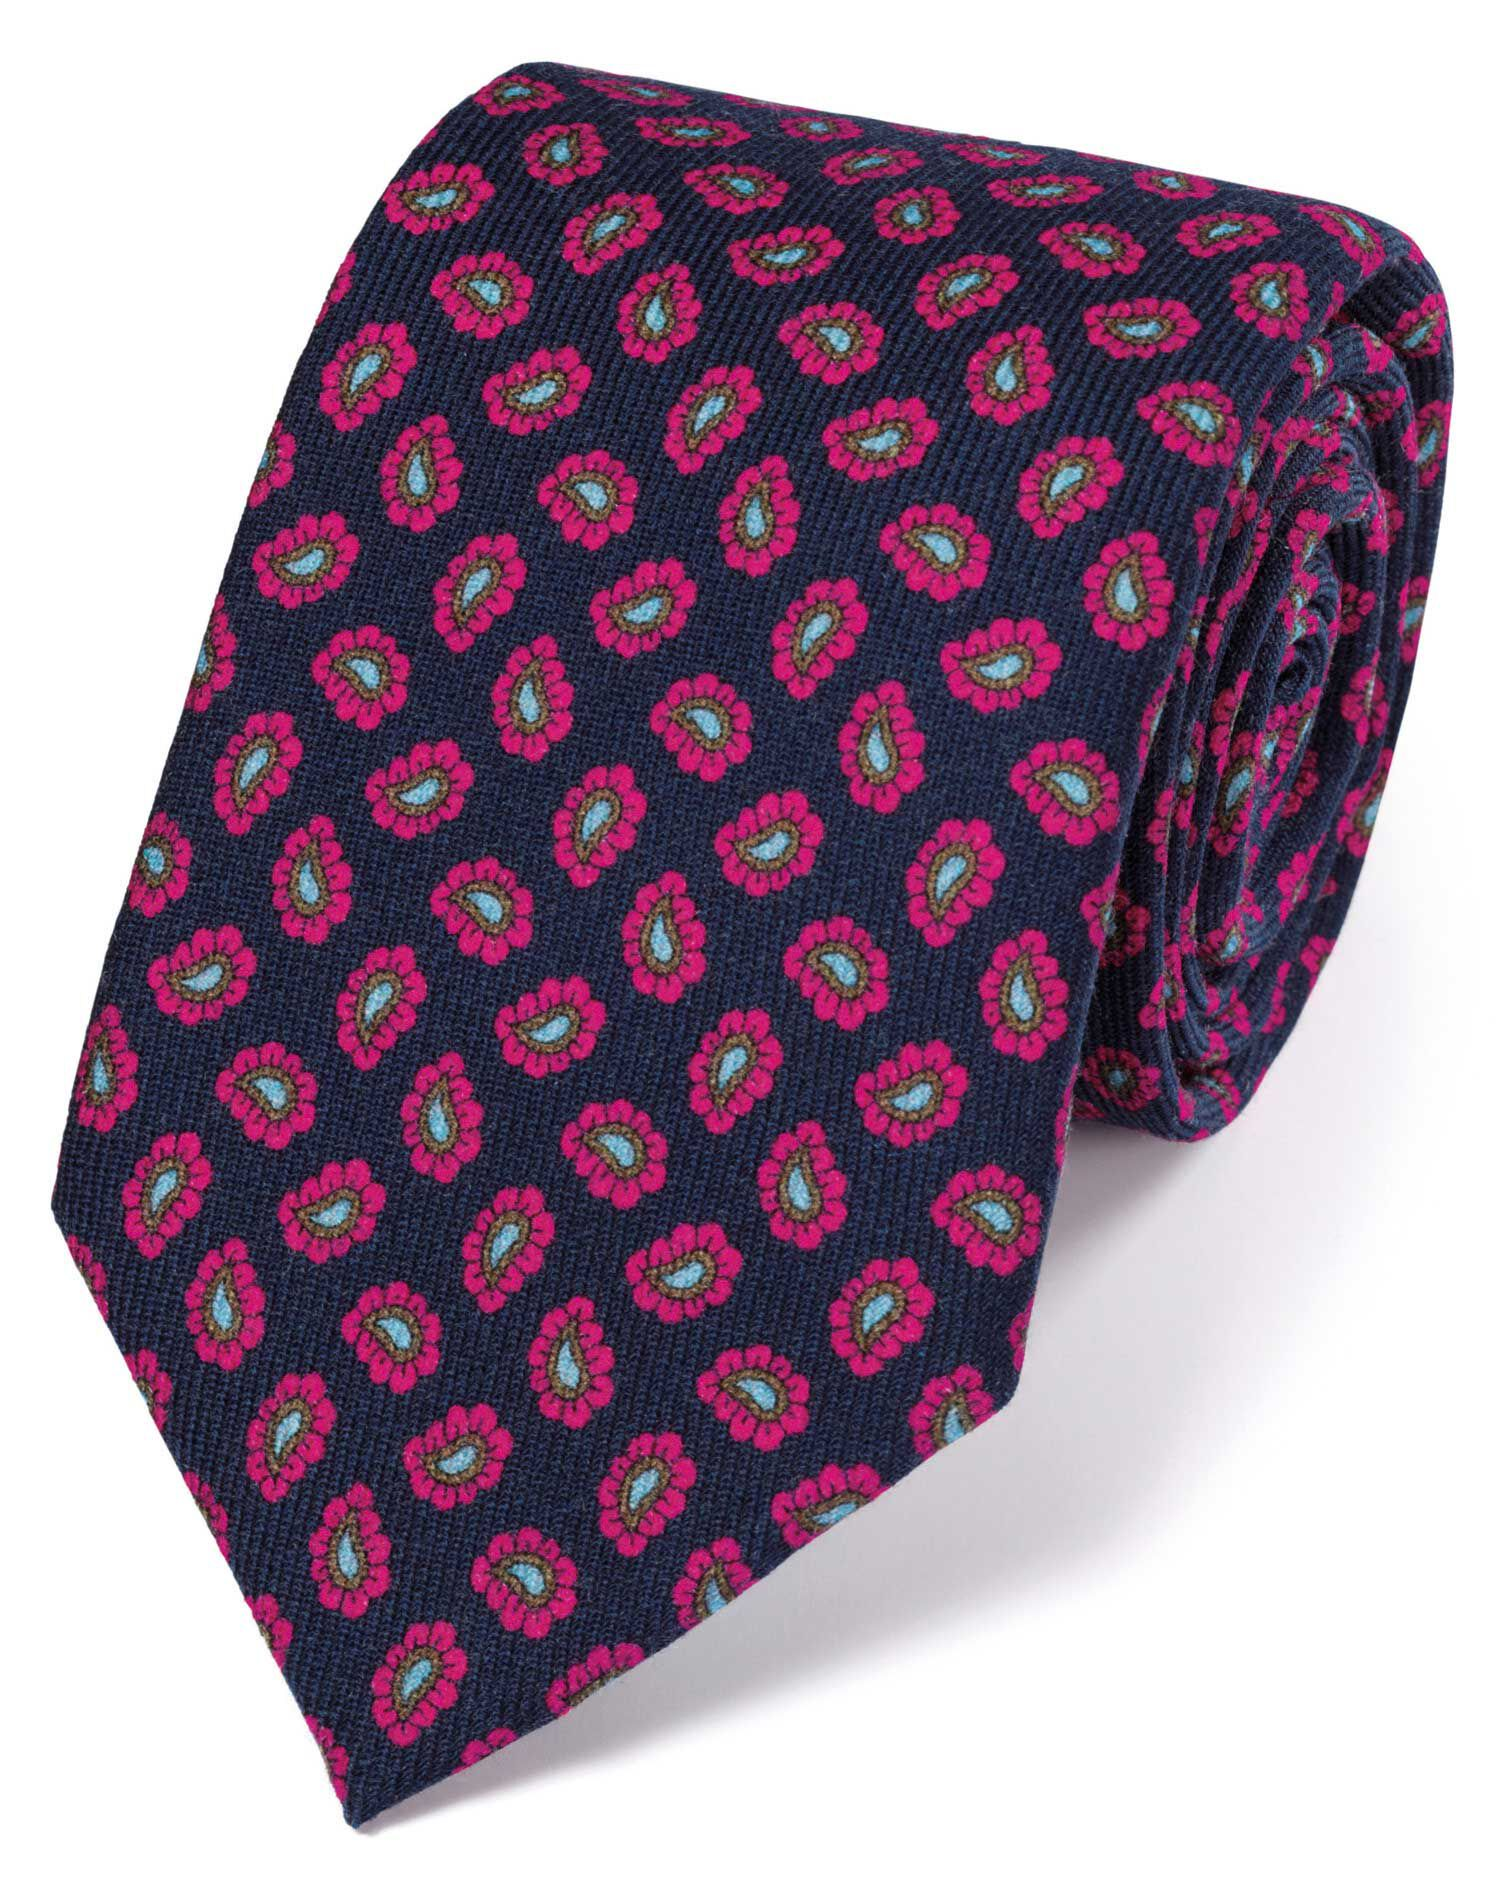 Navy and Pink Silk Print Luxury Tie Size OSFA by Charles Tyrwhitt